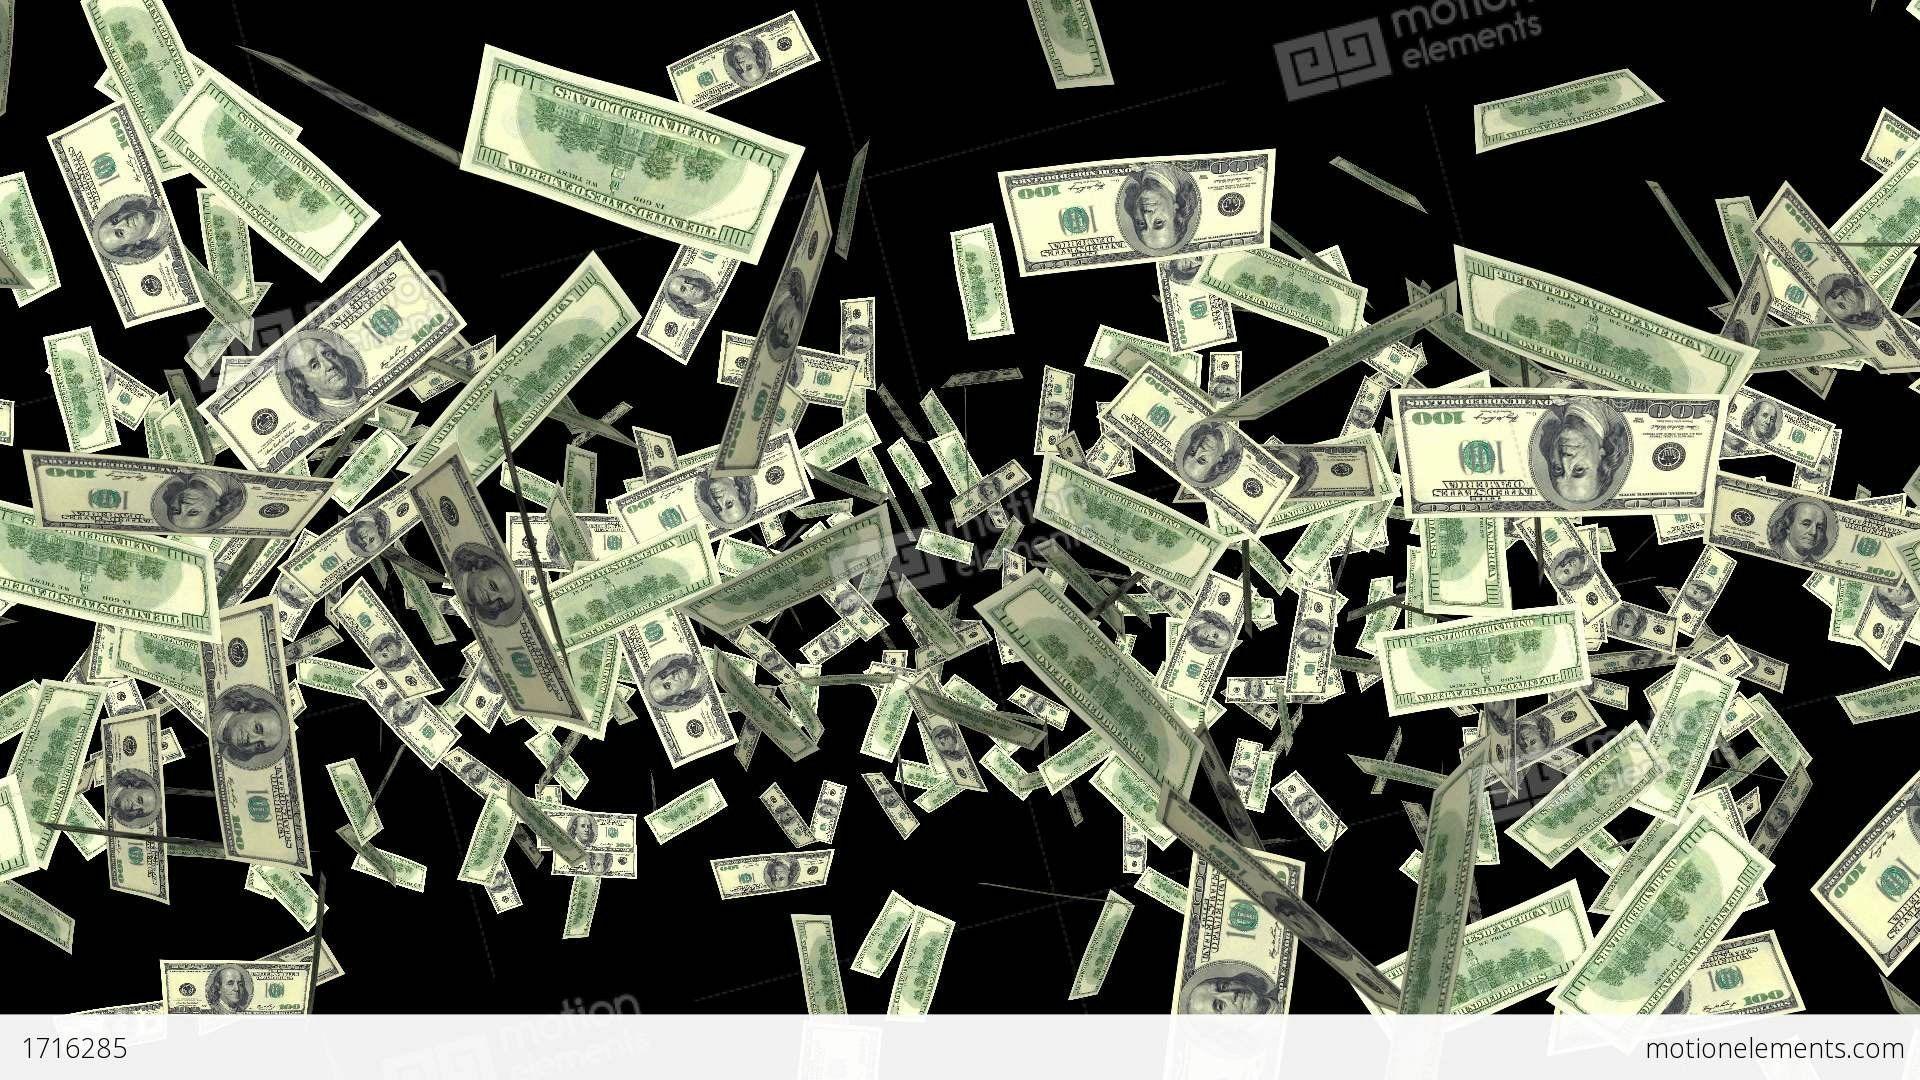 me1716285-money-explosion-usd-bills-hd-a0030-money